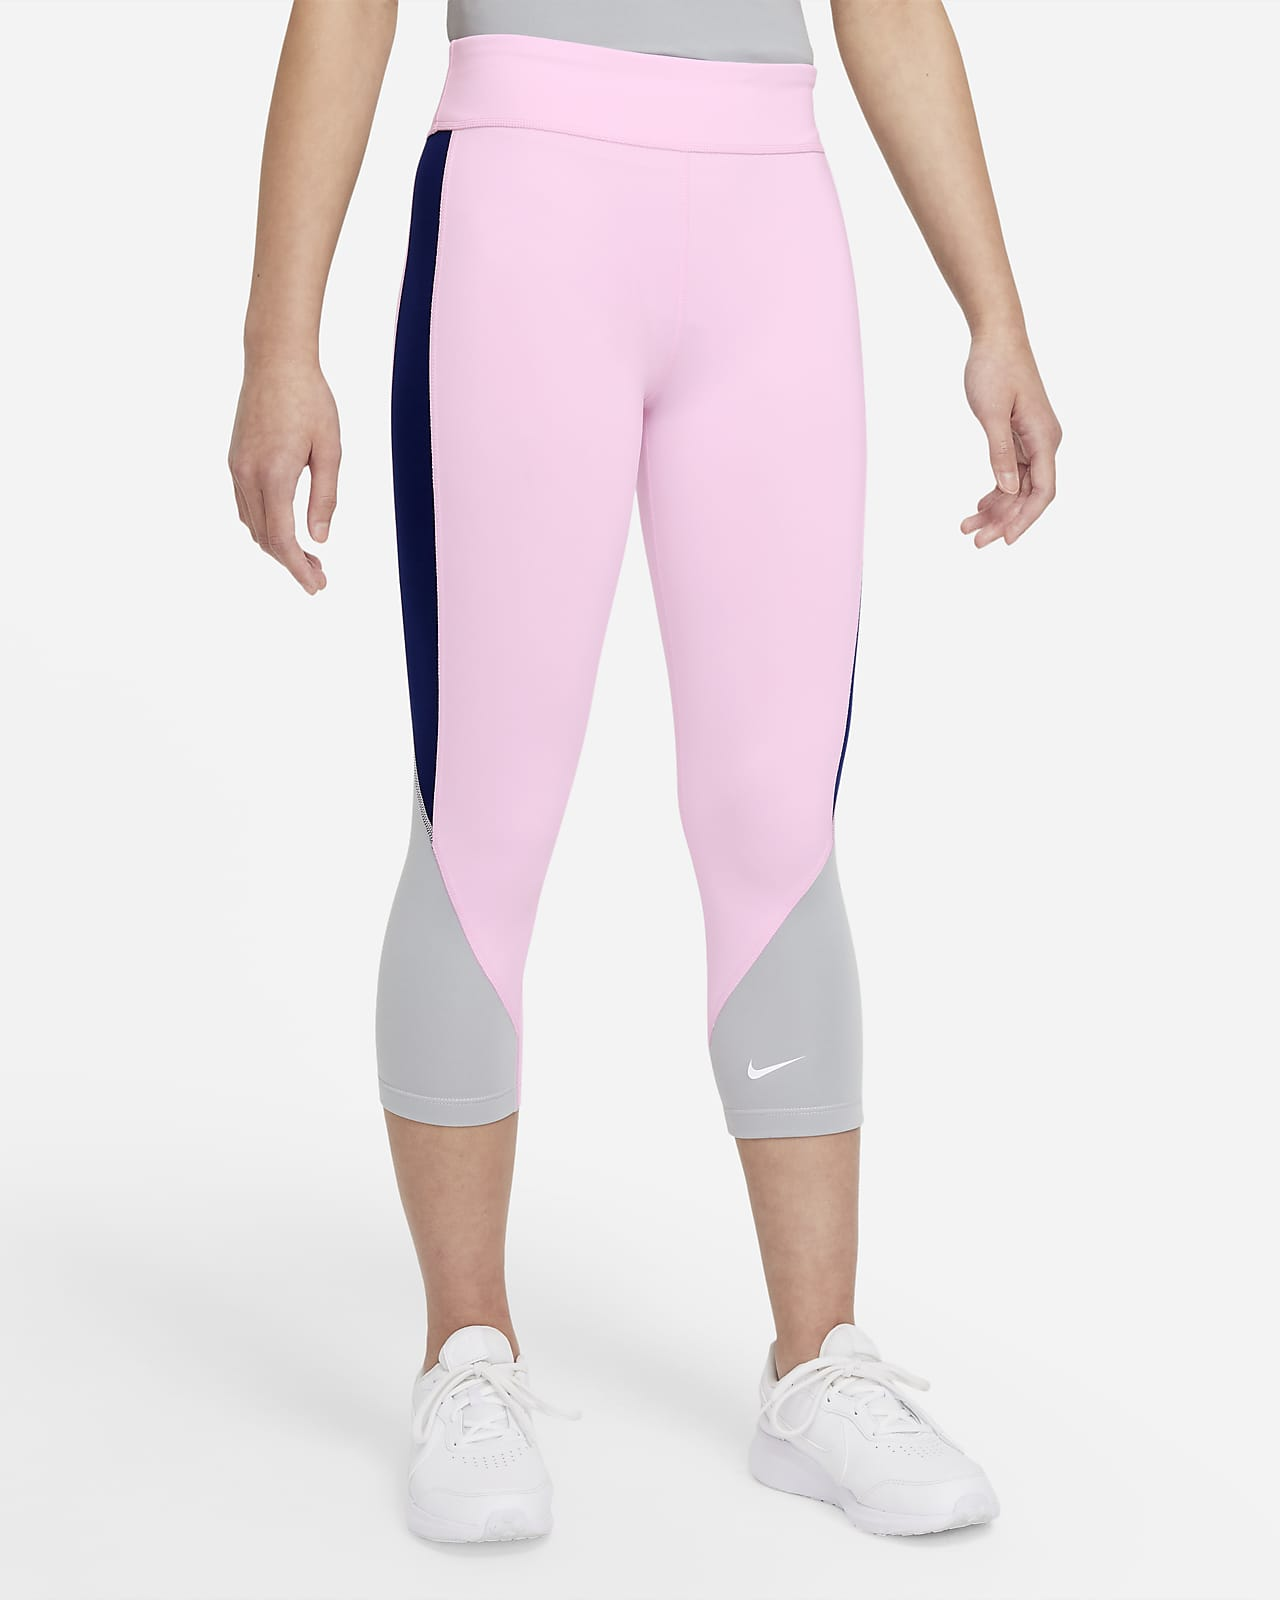 Nike Dri-FIT One 大童 (女童) 高腰七分內搭褲